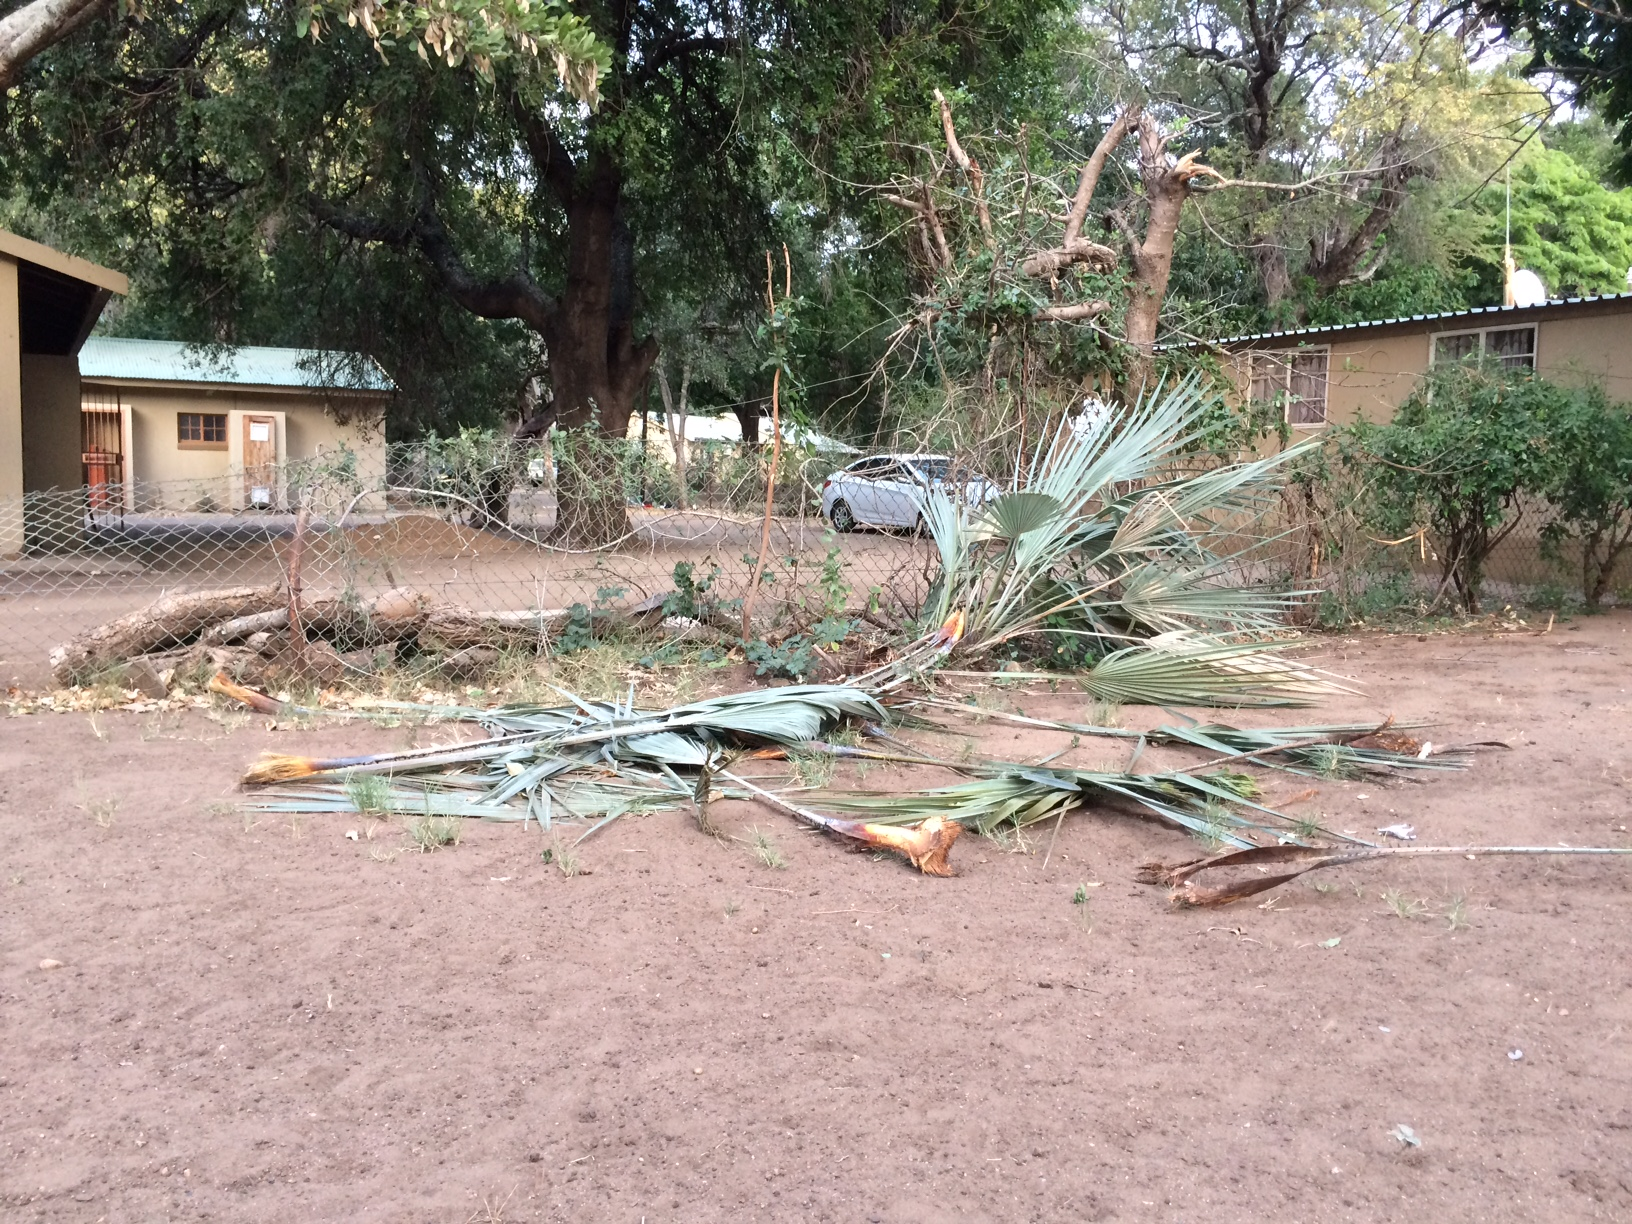 Elephant damage to our lala palm